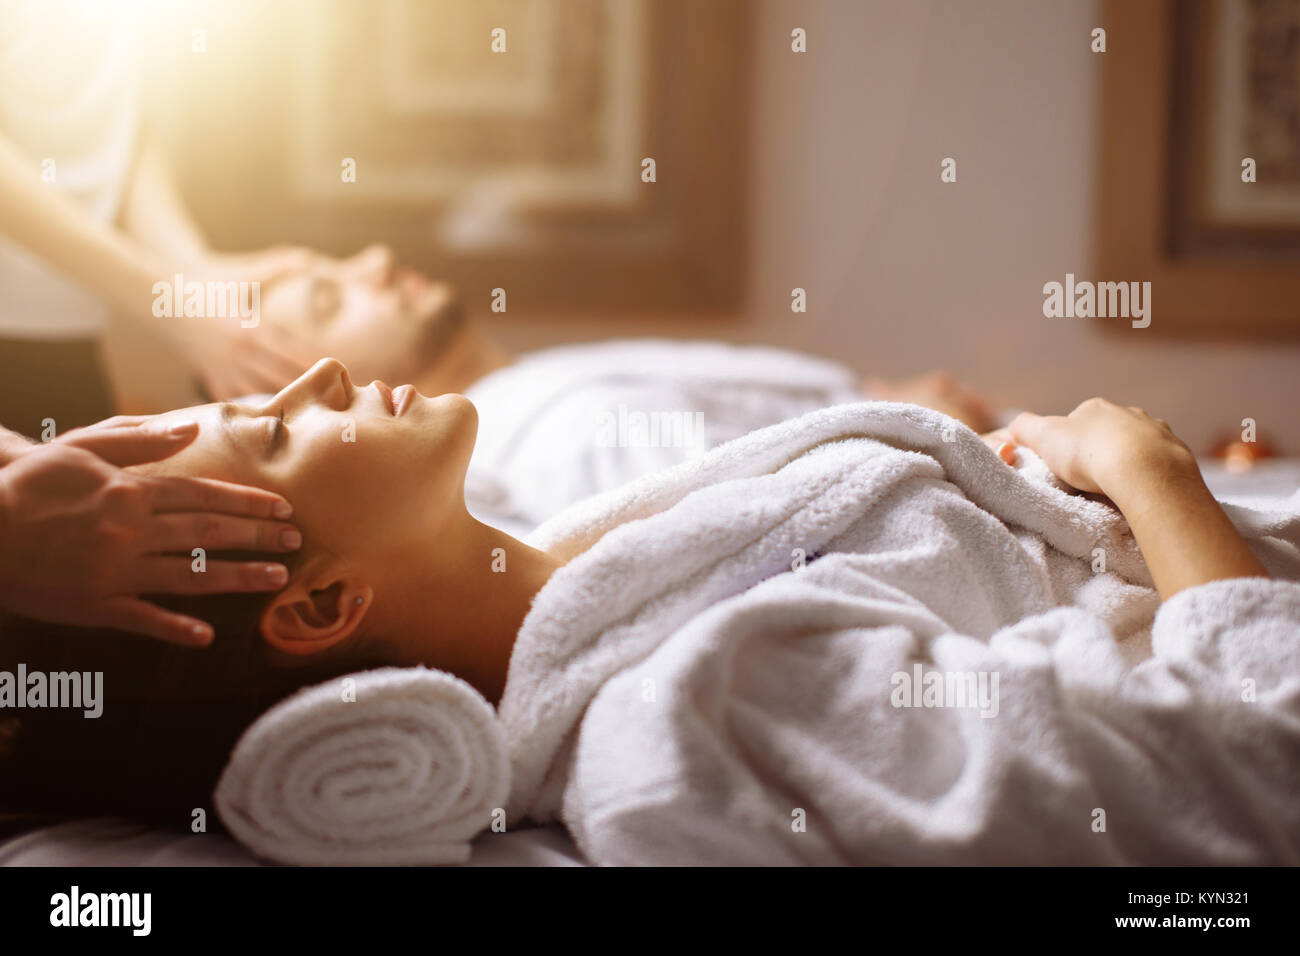 Pareja joven recibir masaje de cabeza en el Beauty Spa Imagen De Stock